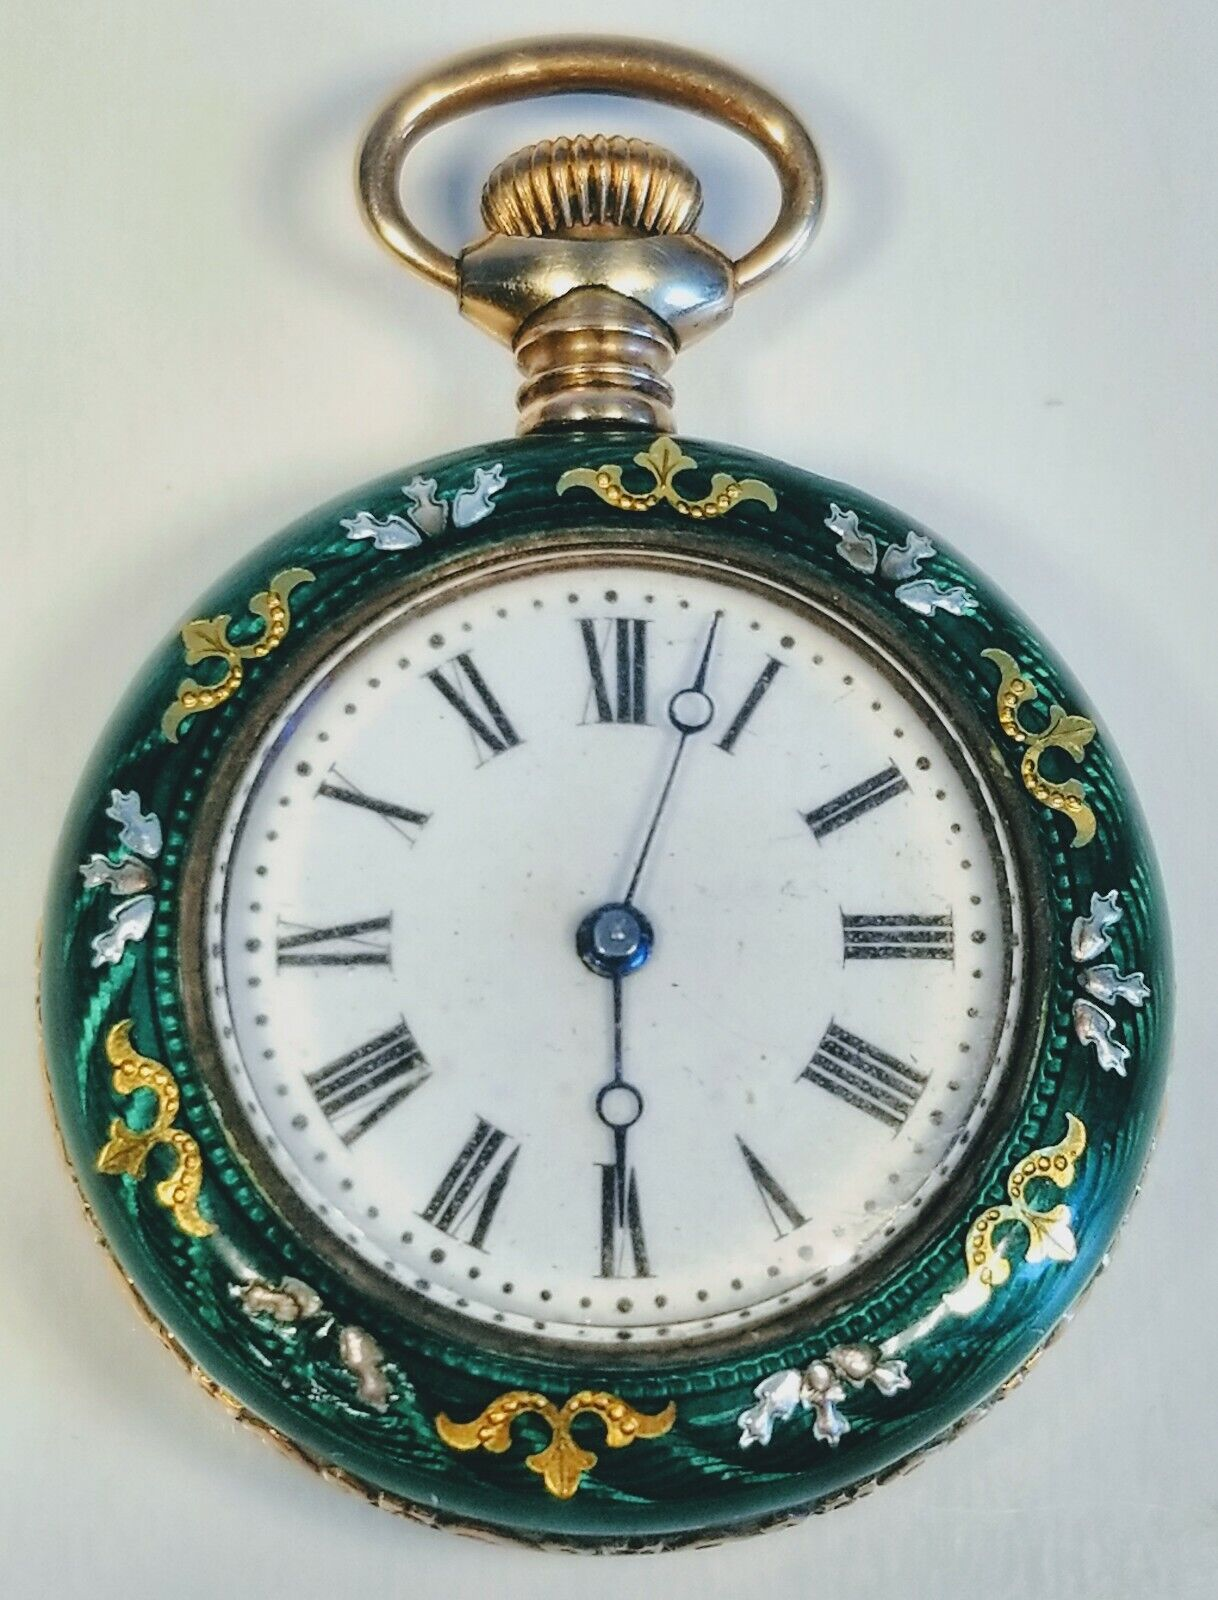 Vintage 1920s Art Deco 14K Yellow Gold Guilloché Green Enamel Round Pocket Watch